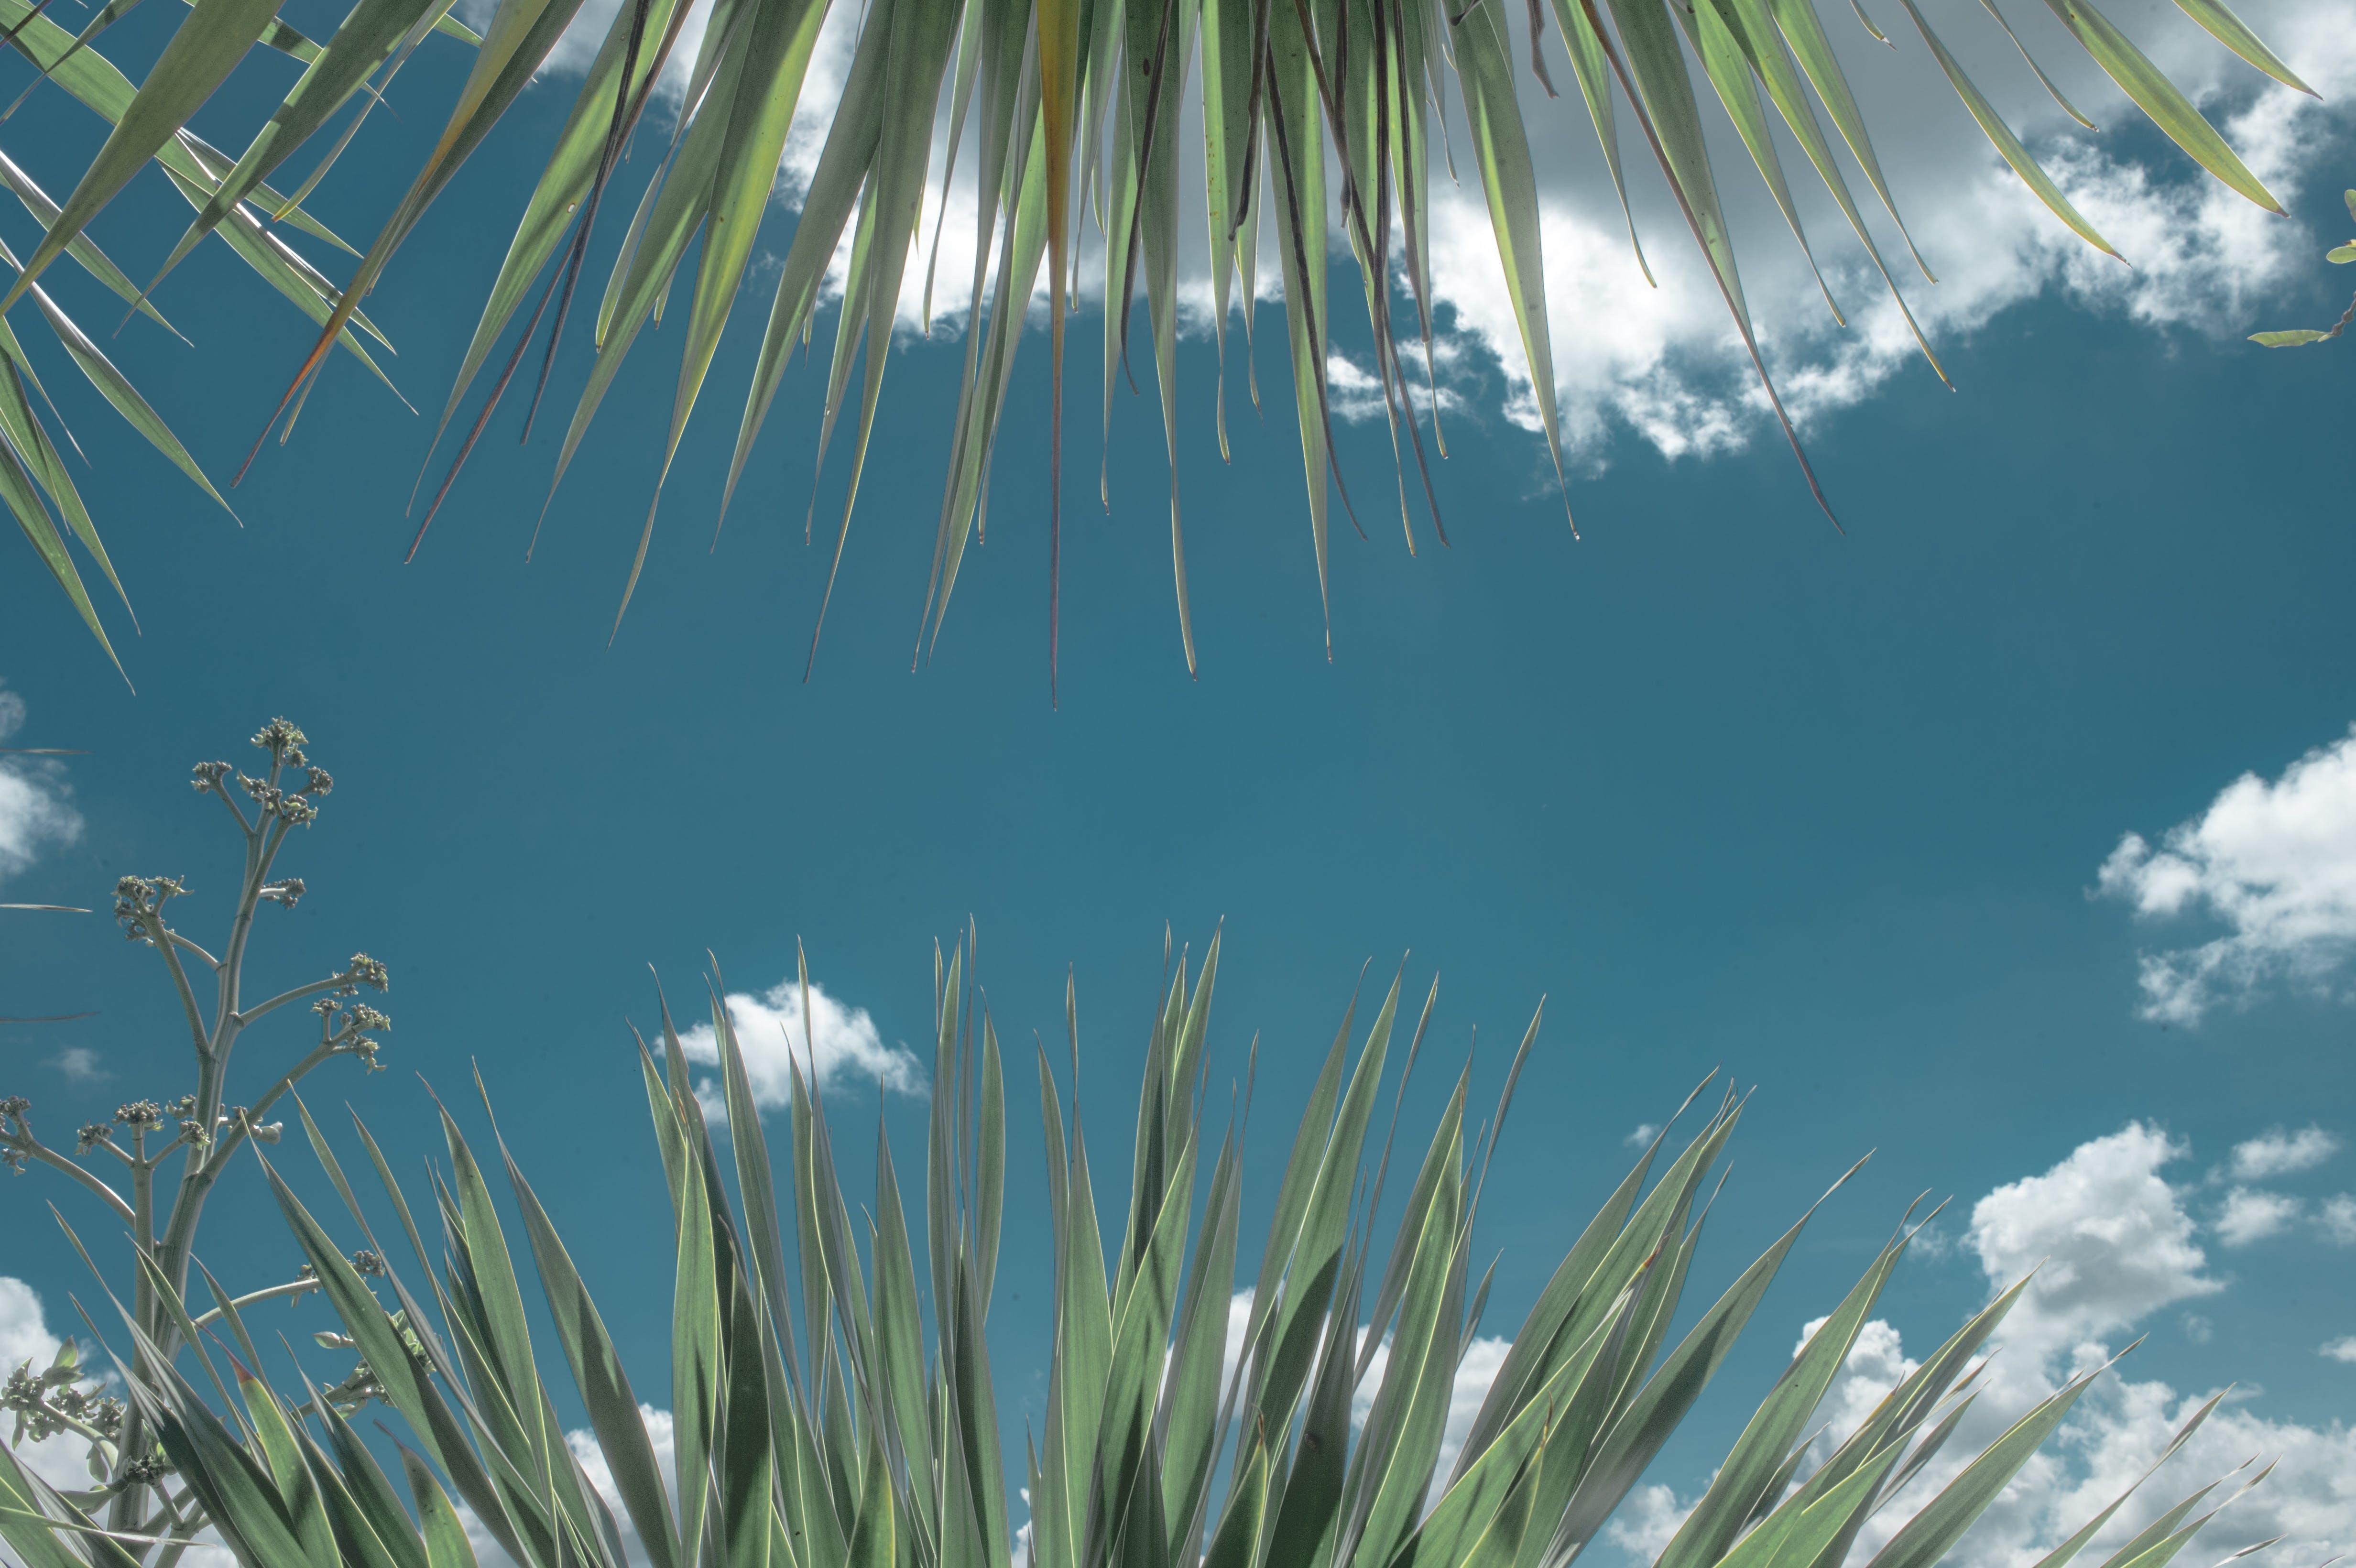 Free stock photo of nature, sky, art, photography